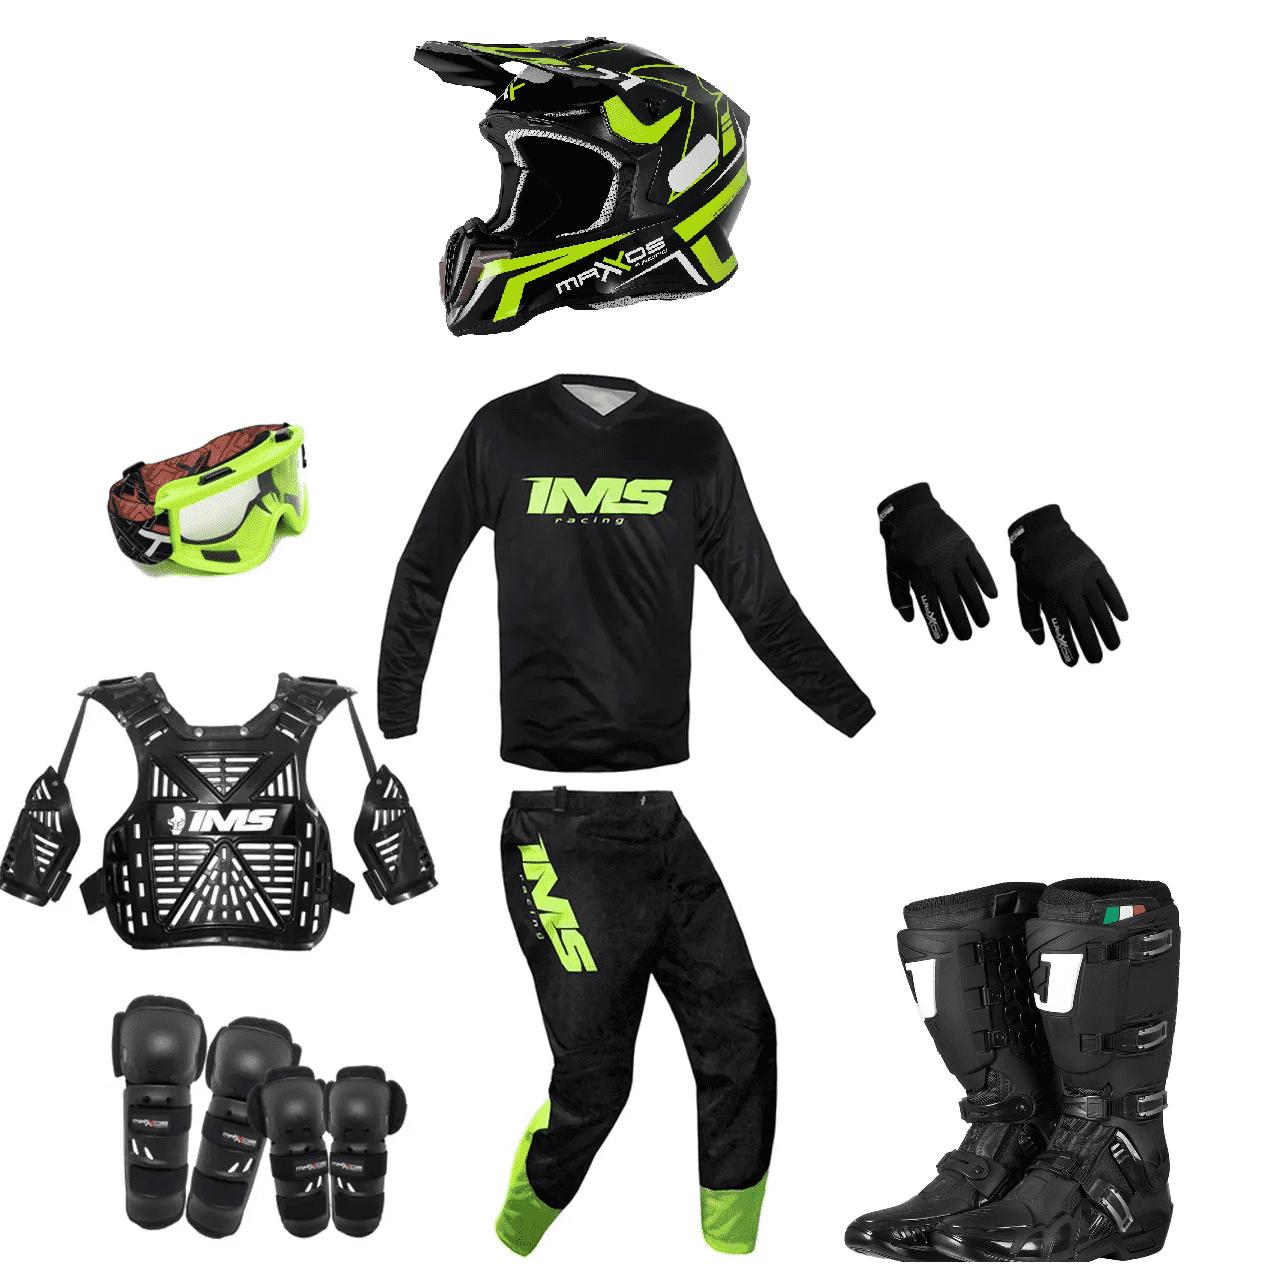 Kit Equipamento Trilha Motocross Enduro Basic 2 - Preto/Fluor